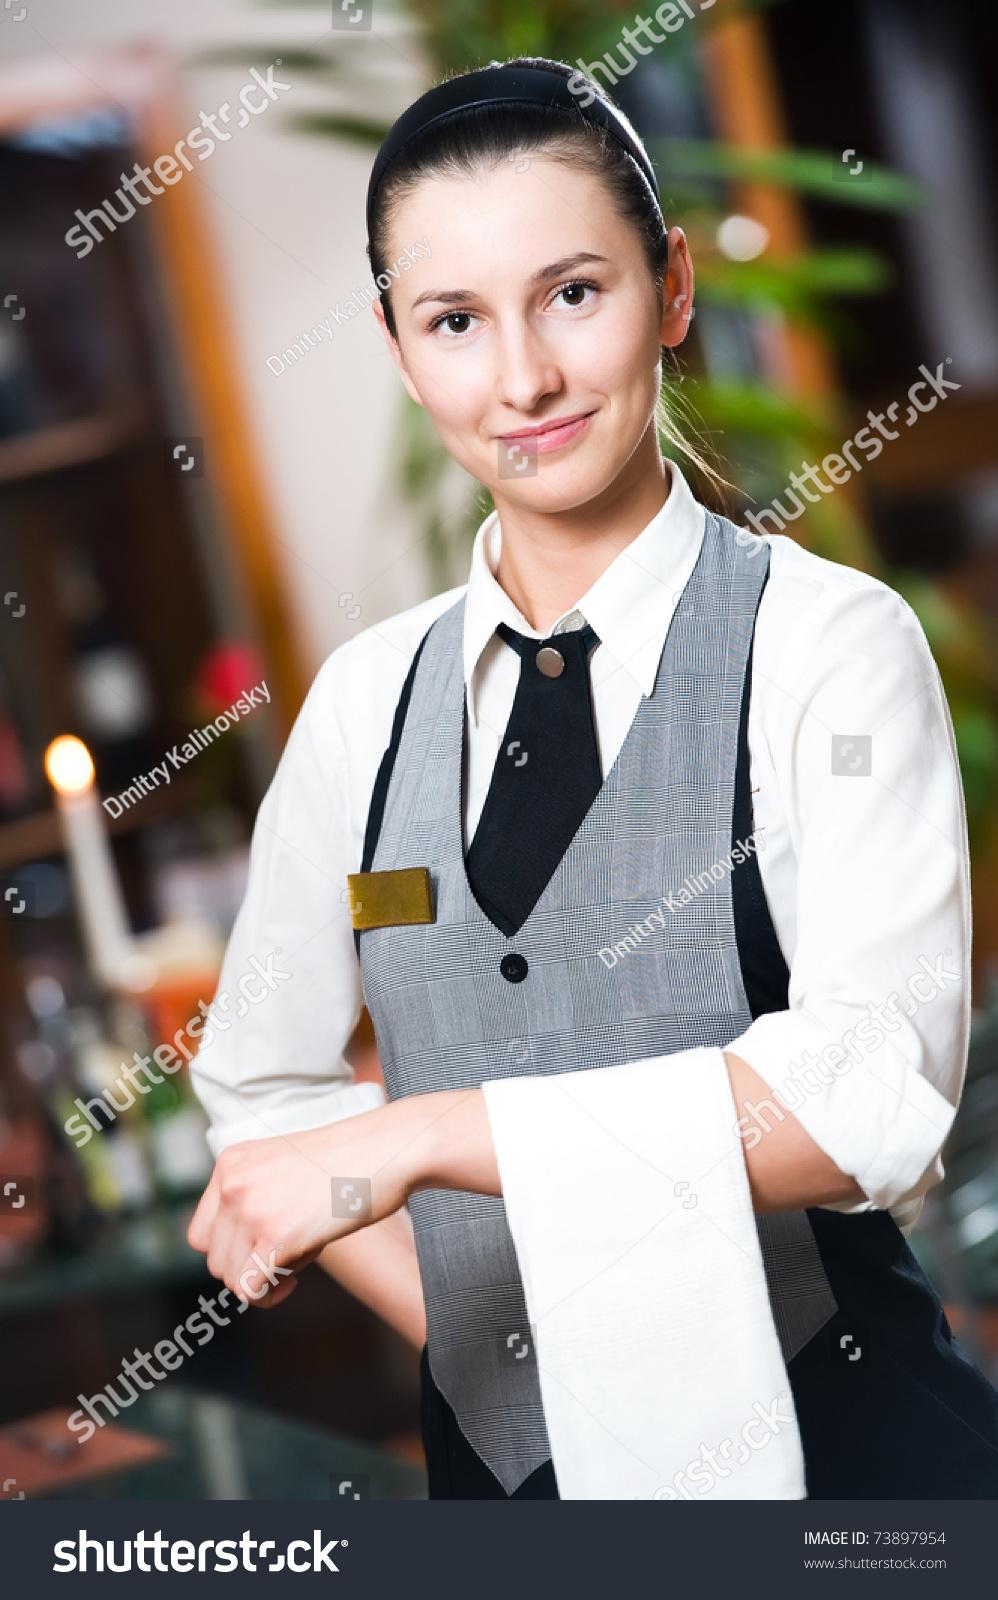 Photo Of The Girl Waitress